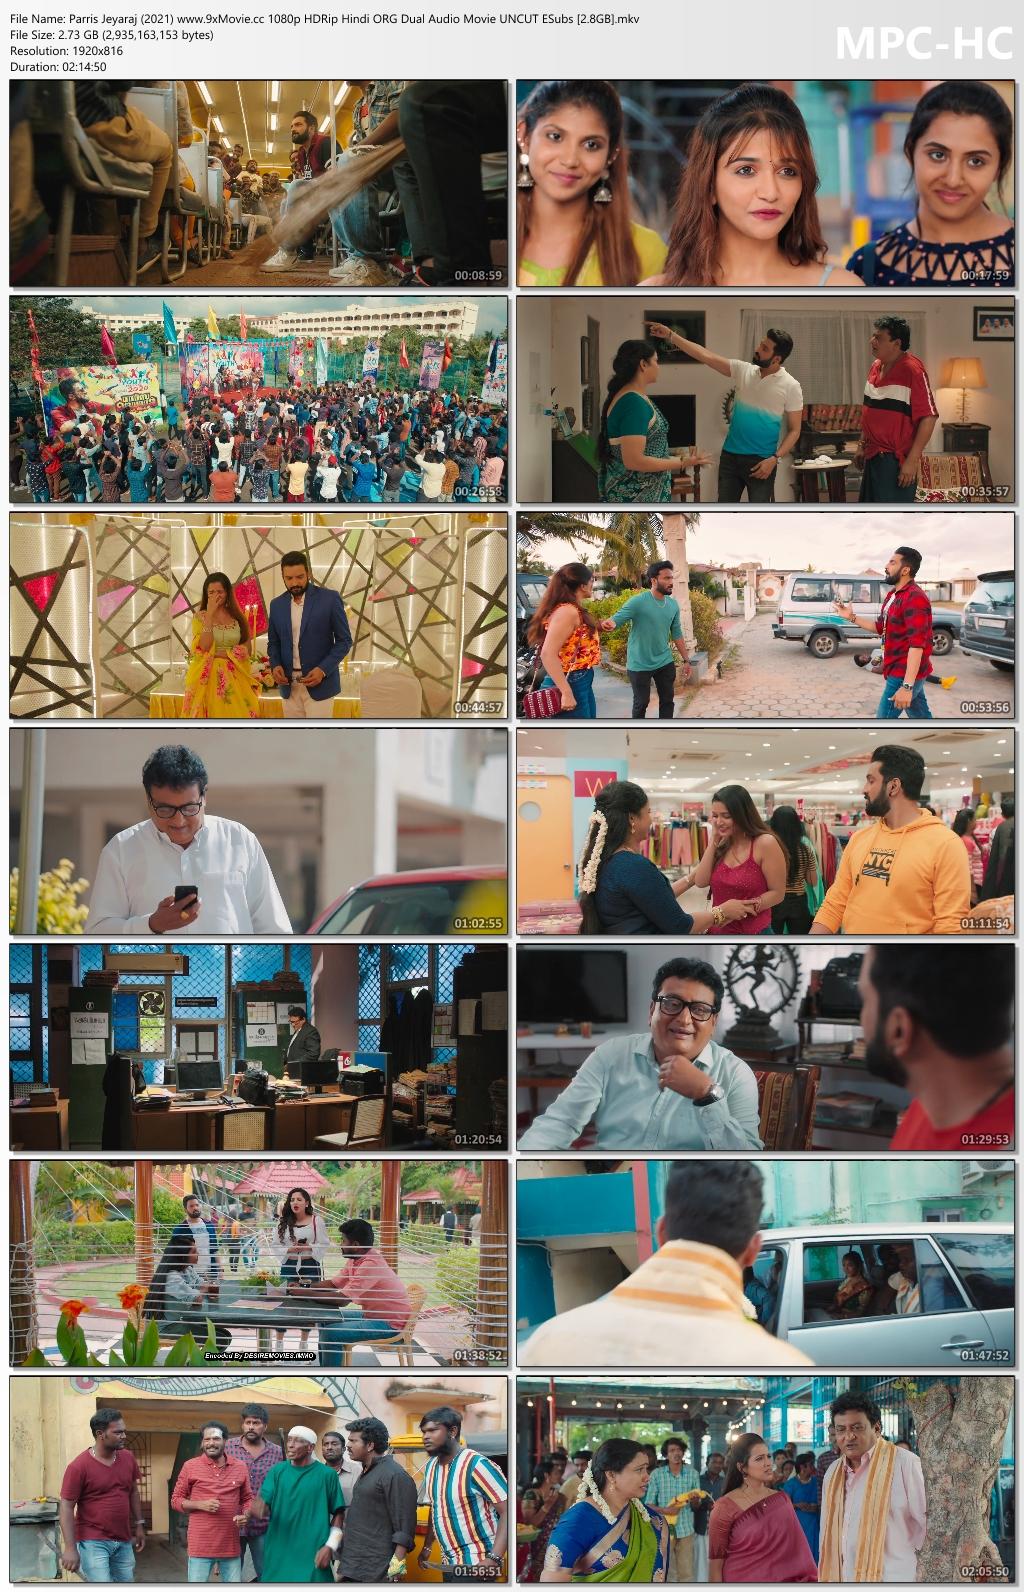 Parris-Jeyaraj-2021-www-9x-Movie-cc-1080p-HDRip-Hindi-ORG-Dual-Audio-Movie-UNCUT-ESubs-2-8-GB-mkv